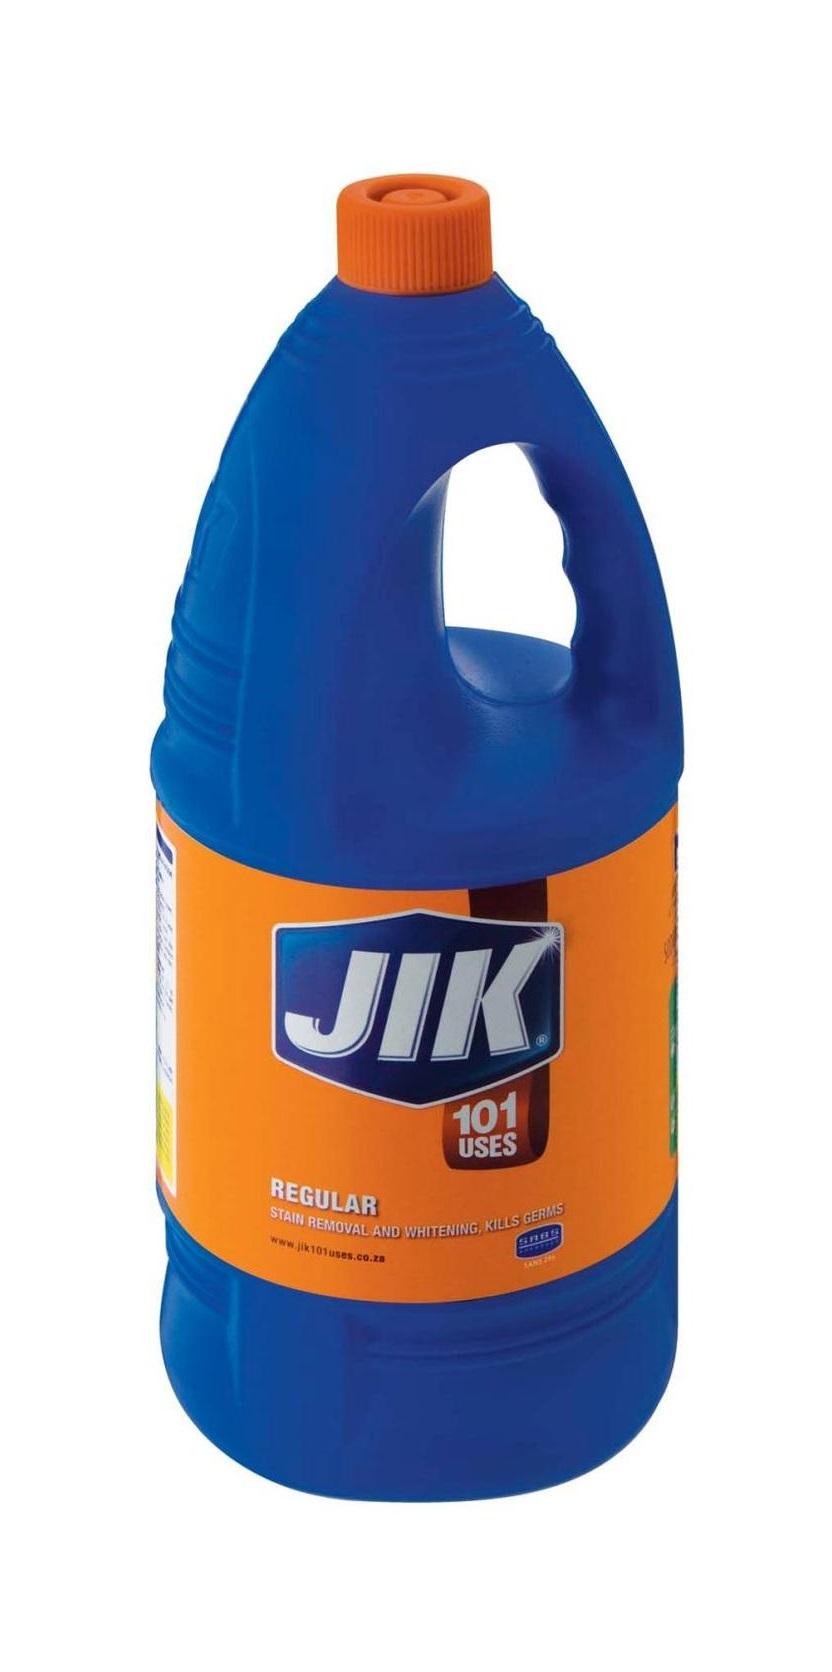 Jik Household Bleech Regular 1.5 Litres